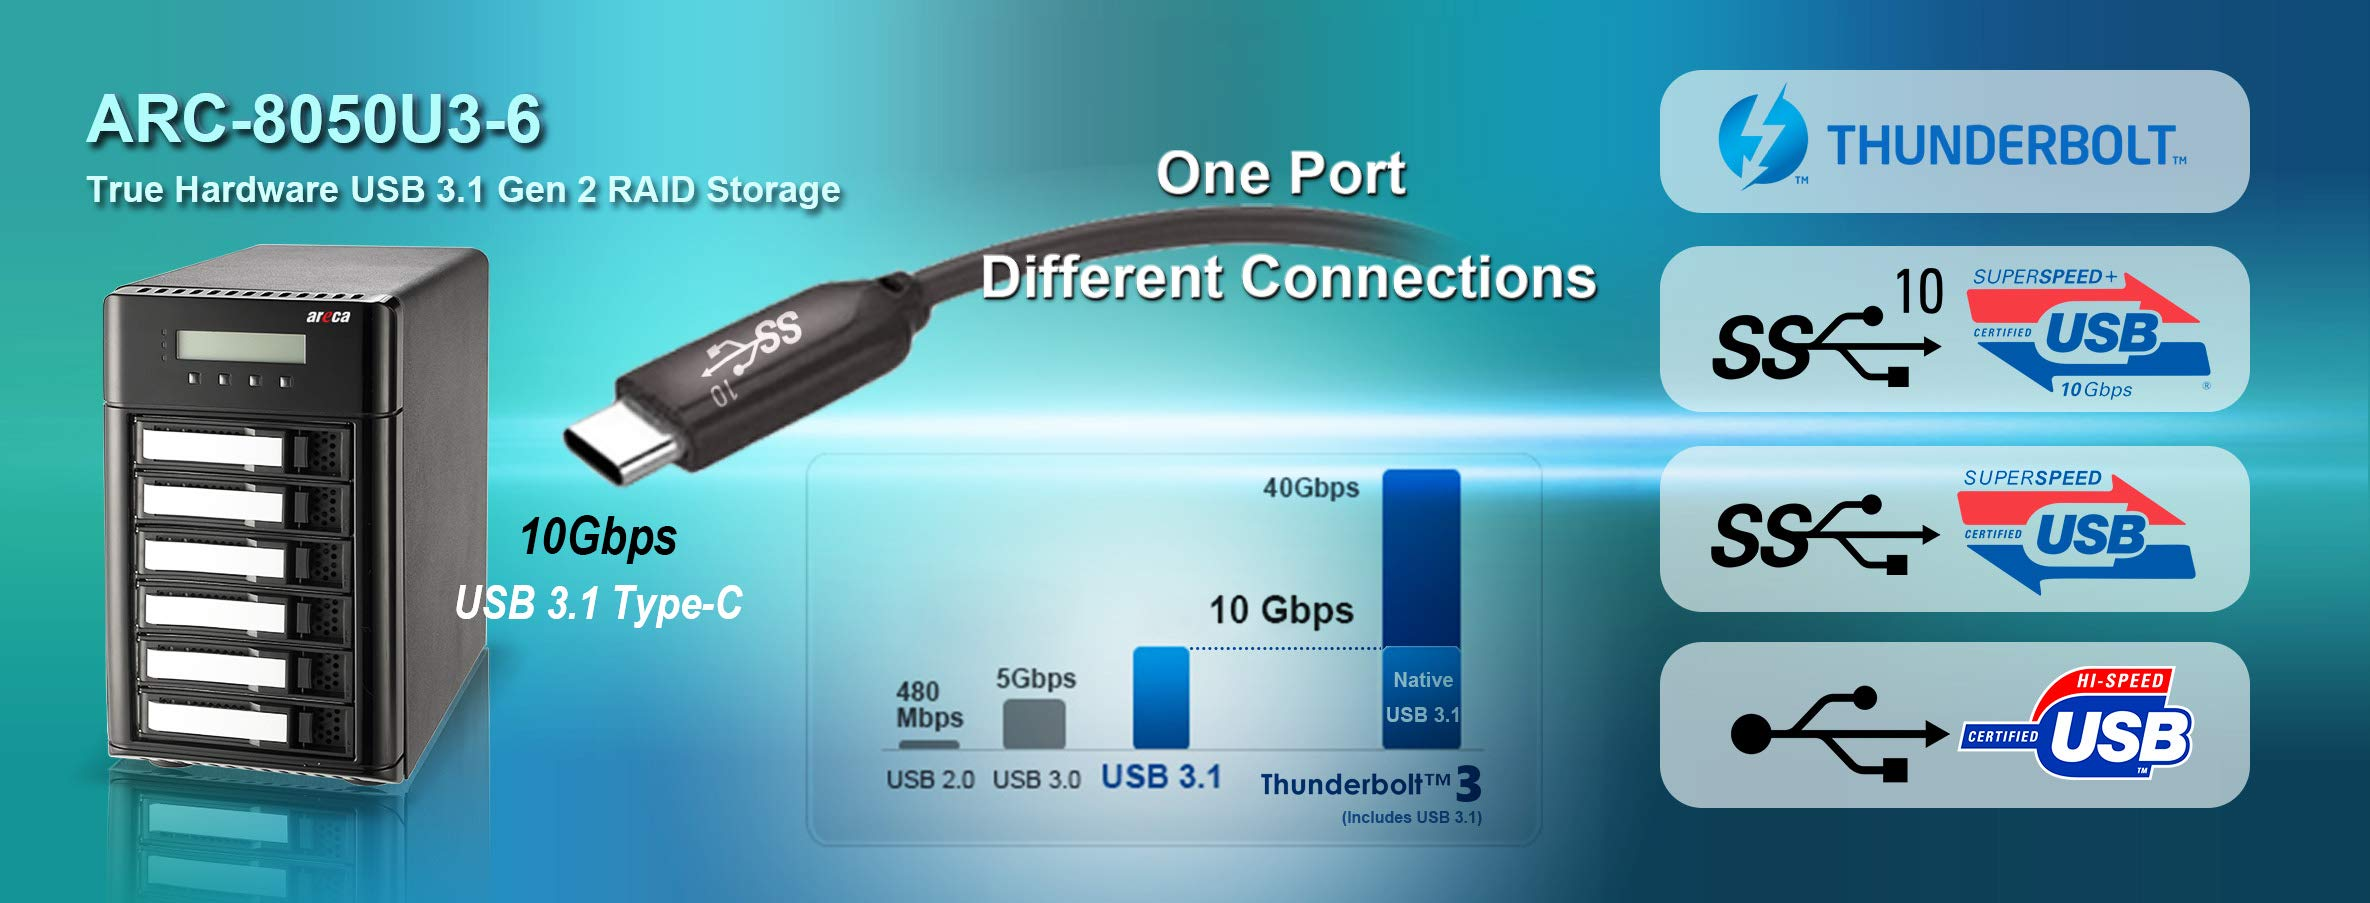 Areca ARC-8050U3-6 (6 Bay USB 3.1 Gen 2 to 12Gb/s SAS RAID Enclosure)